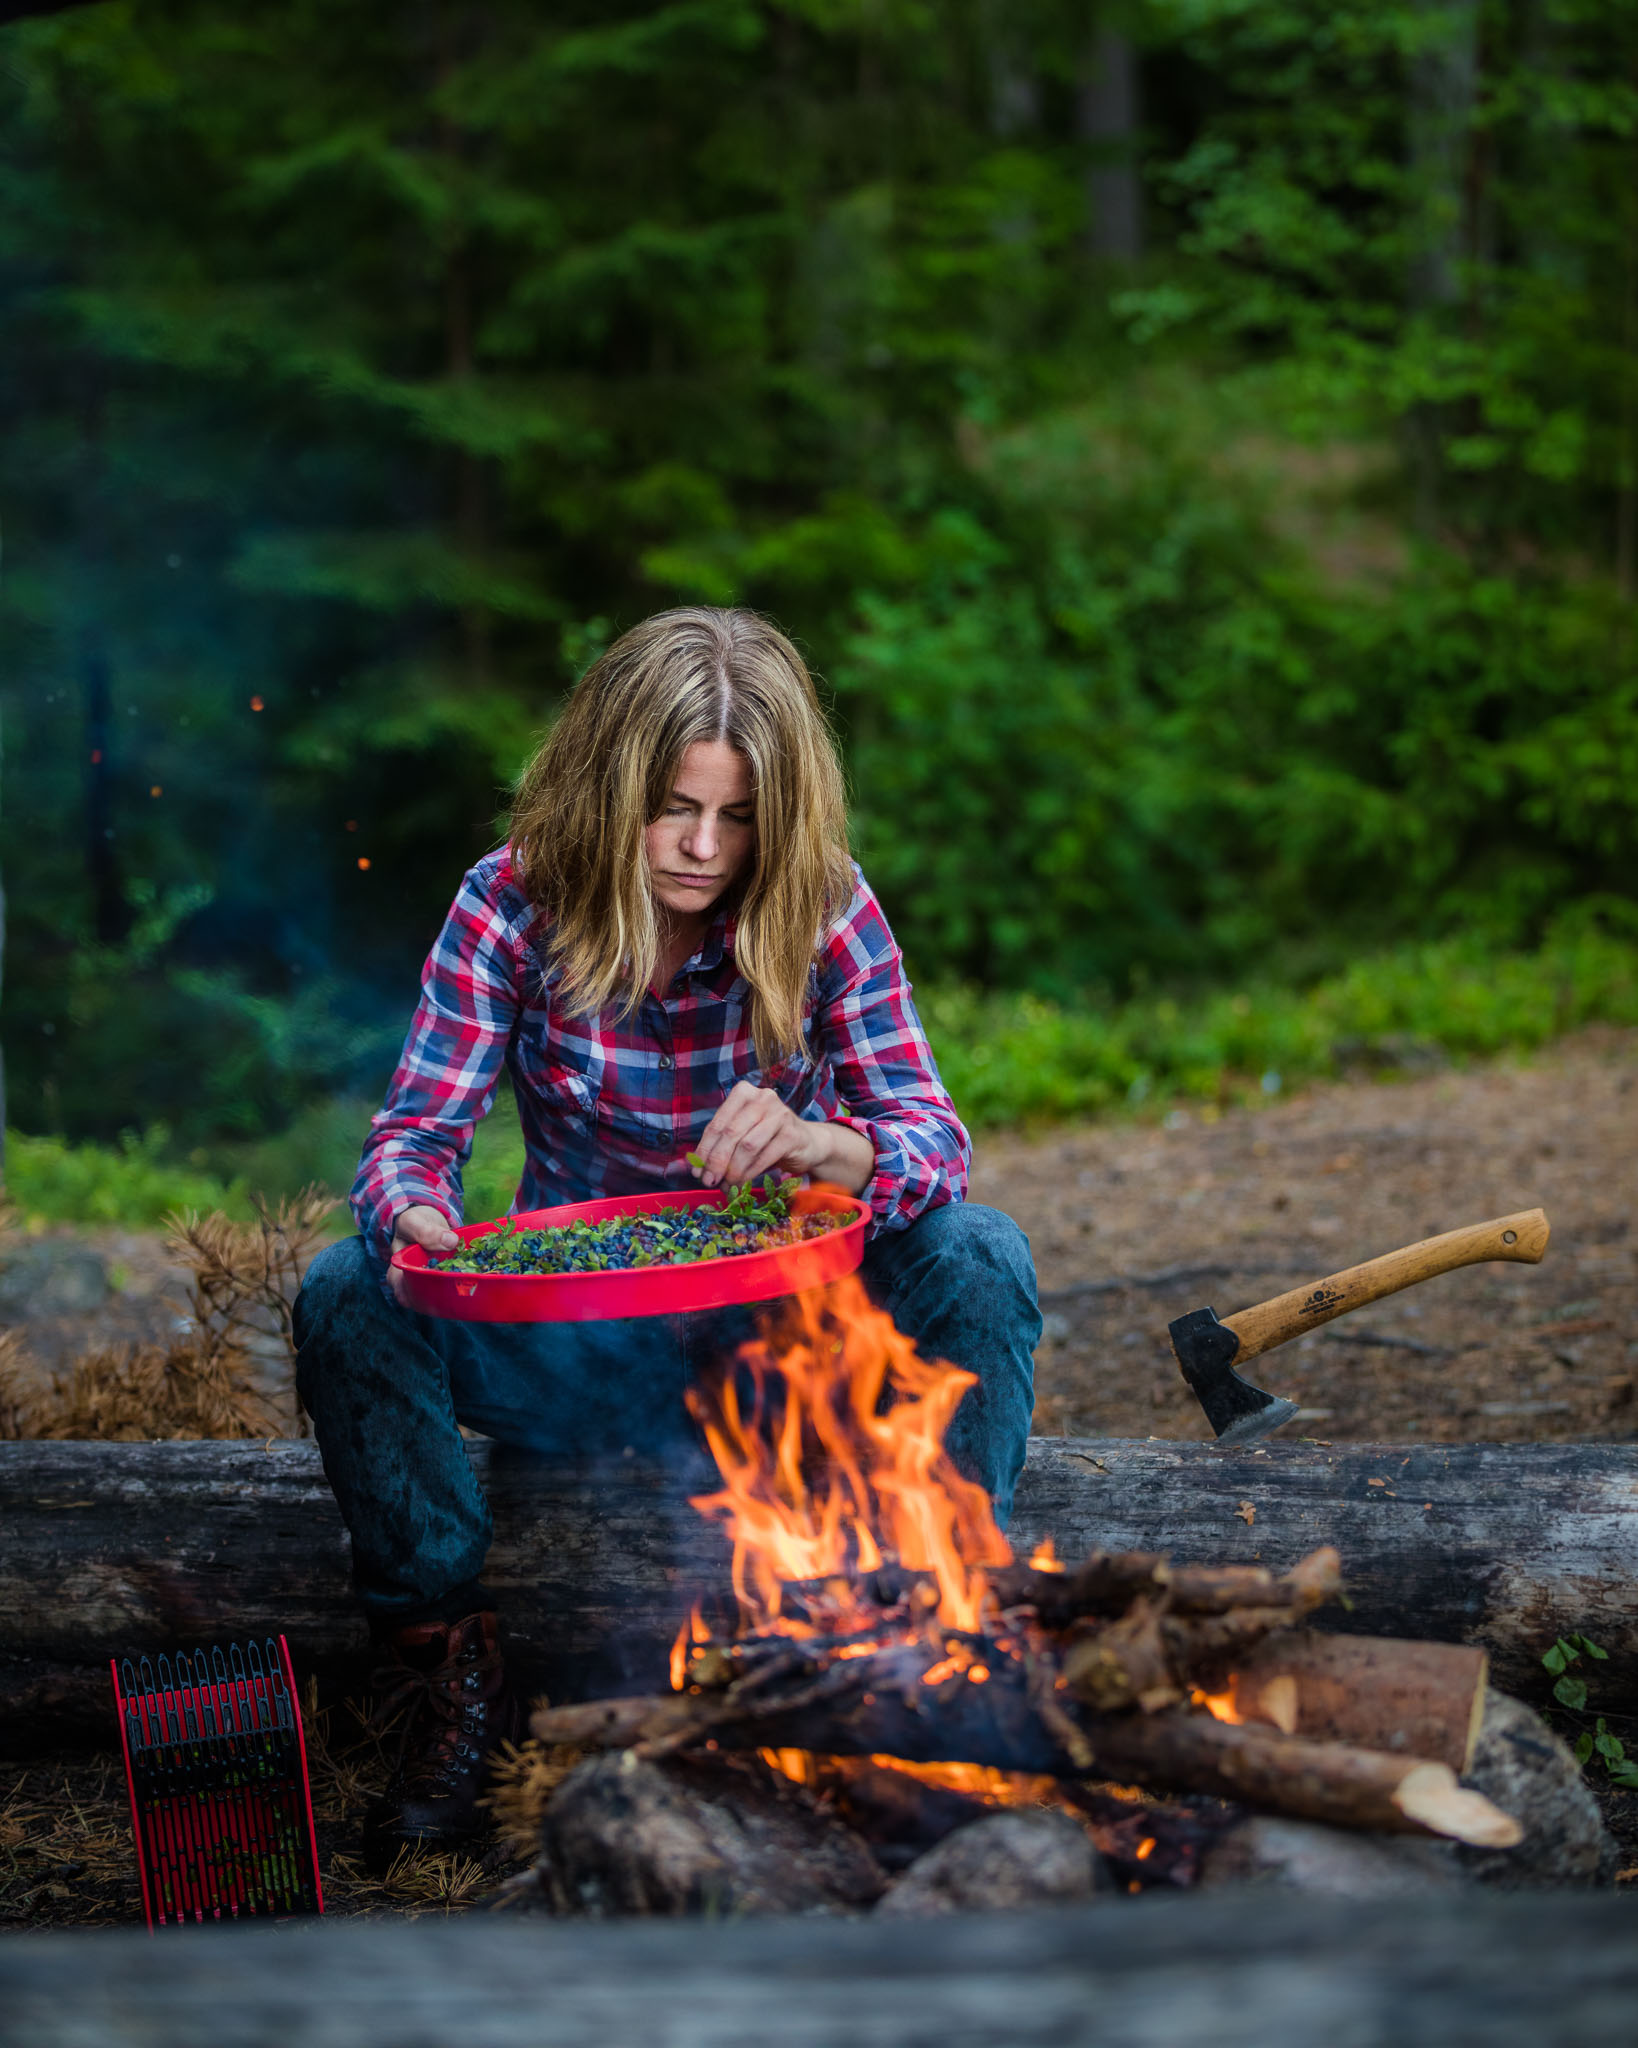 sweden-nature-outdoor-blueberries-fire-woman